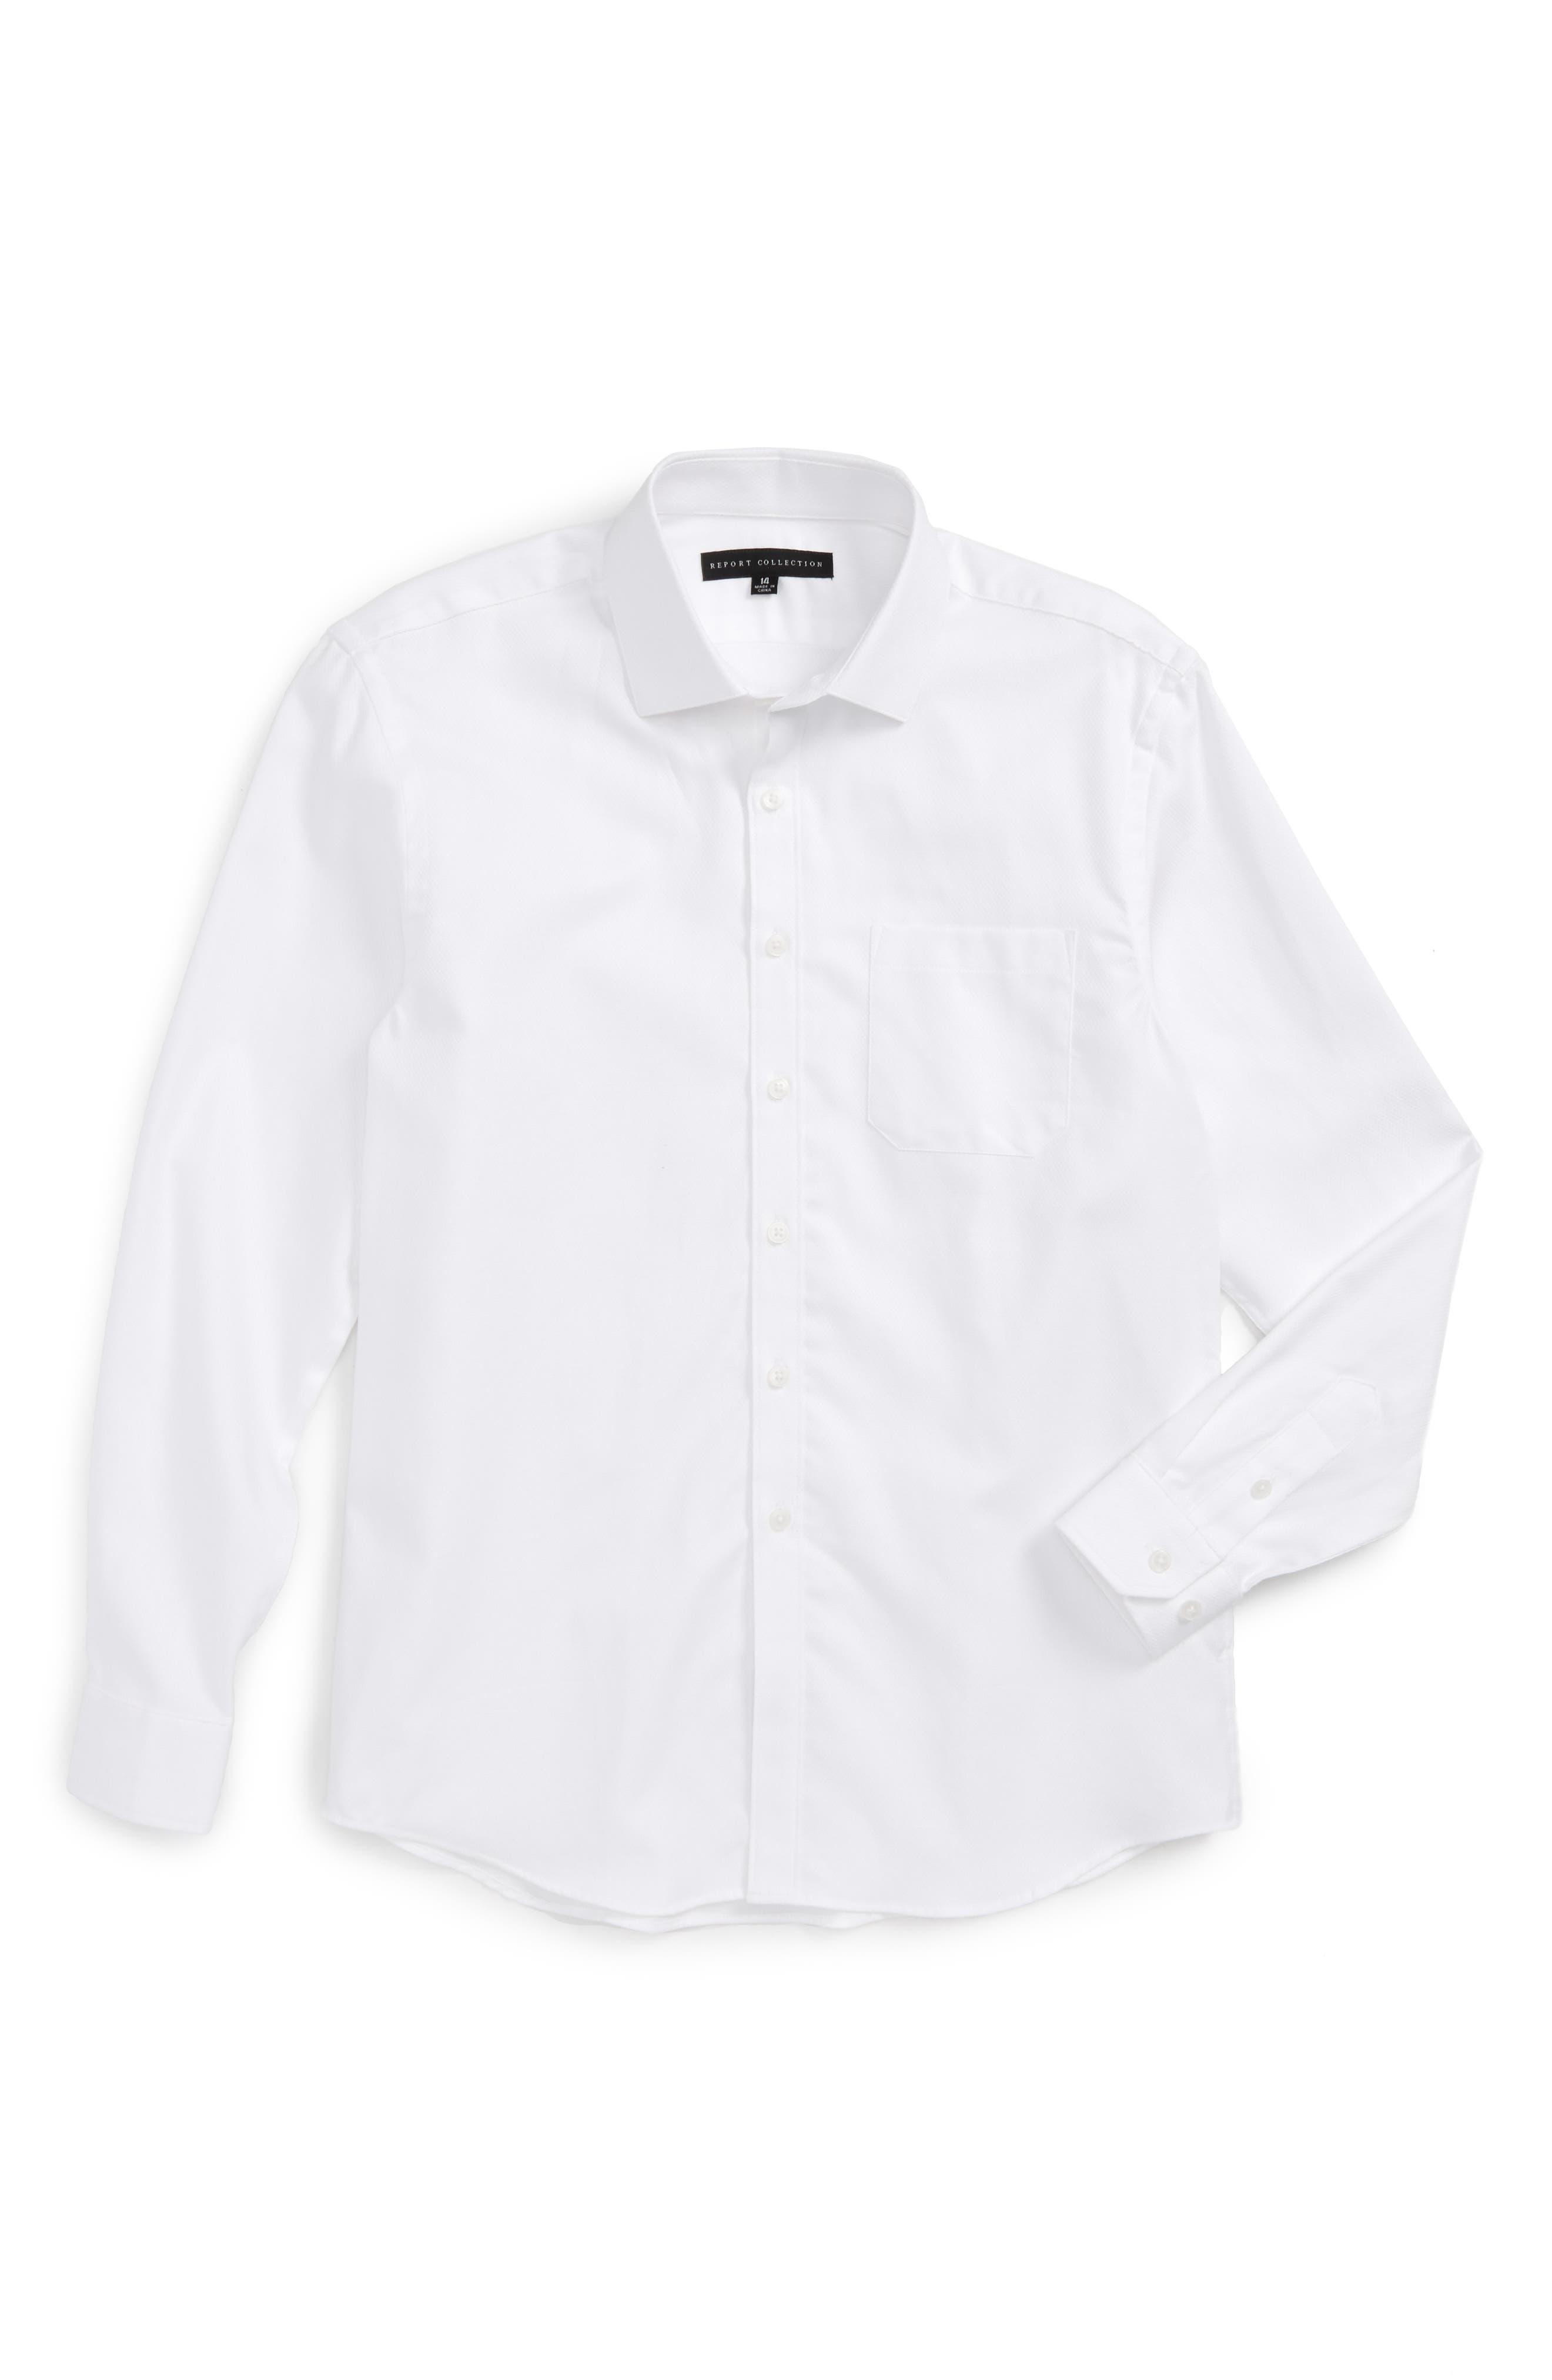 Textured Dress Shirt,                         Main,                         color, White